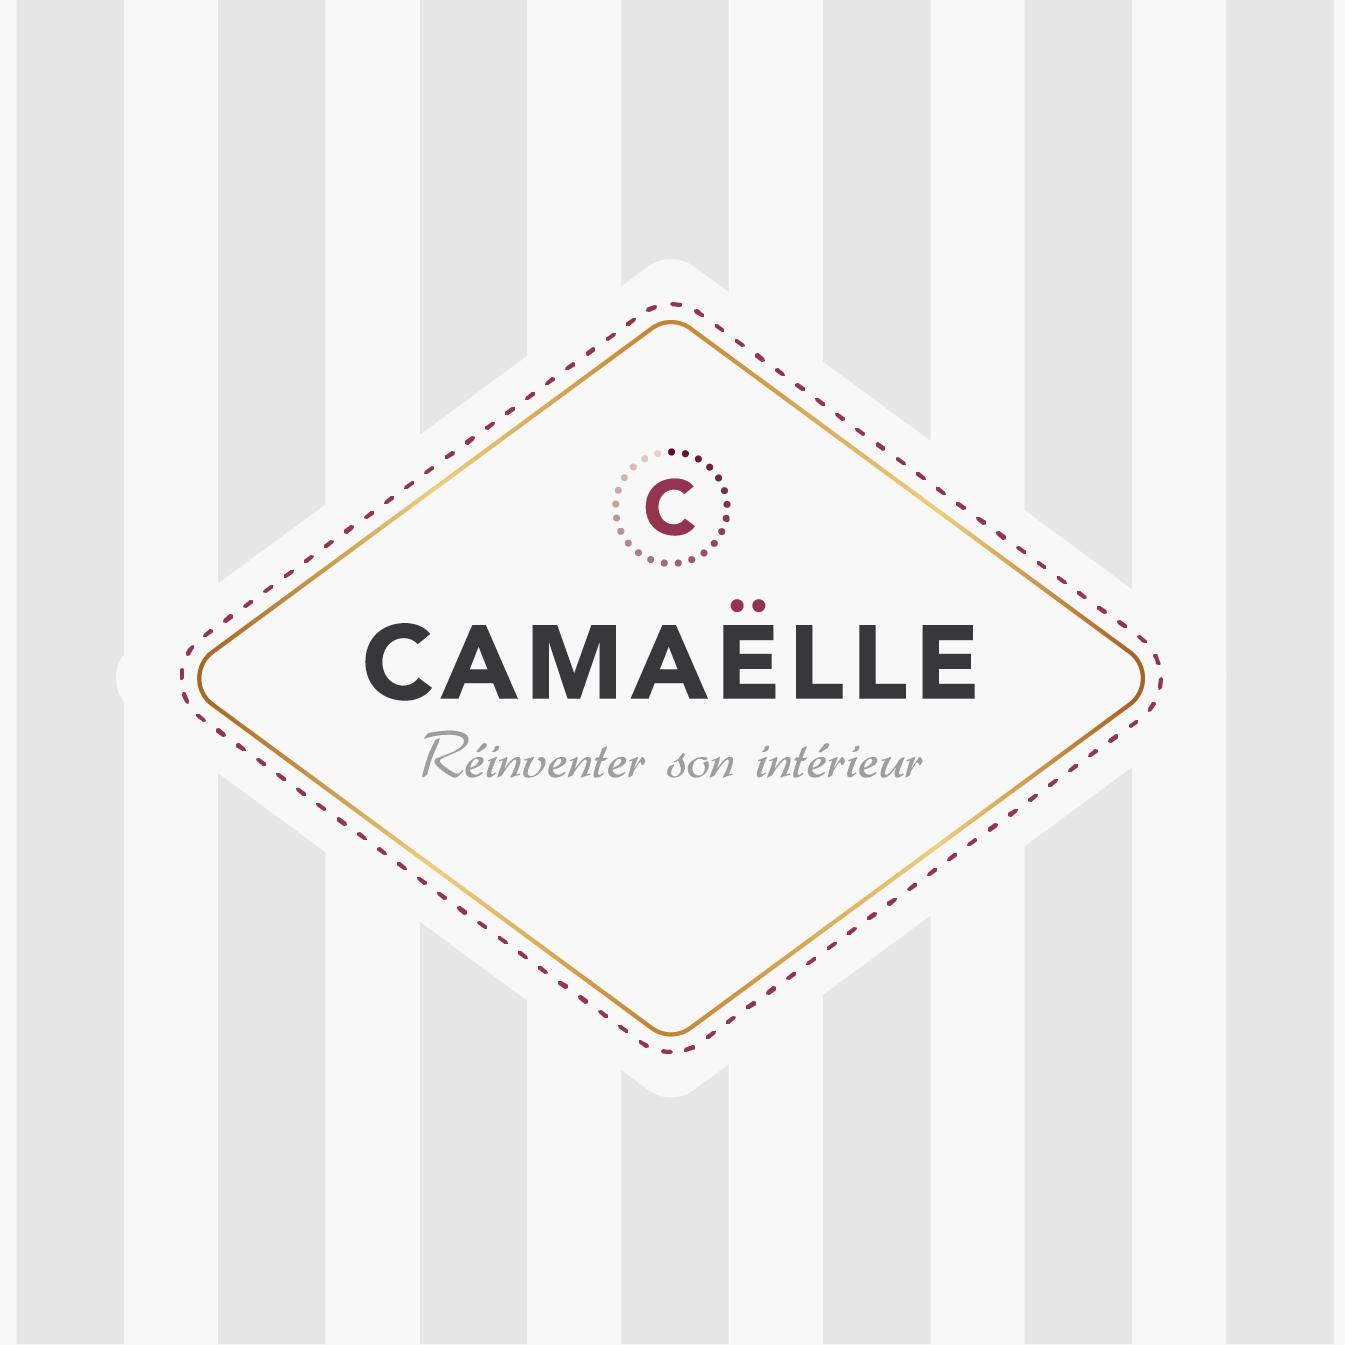 LOGO_CAMAELLE